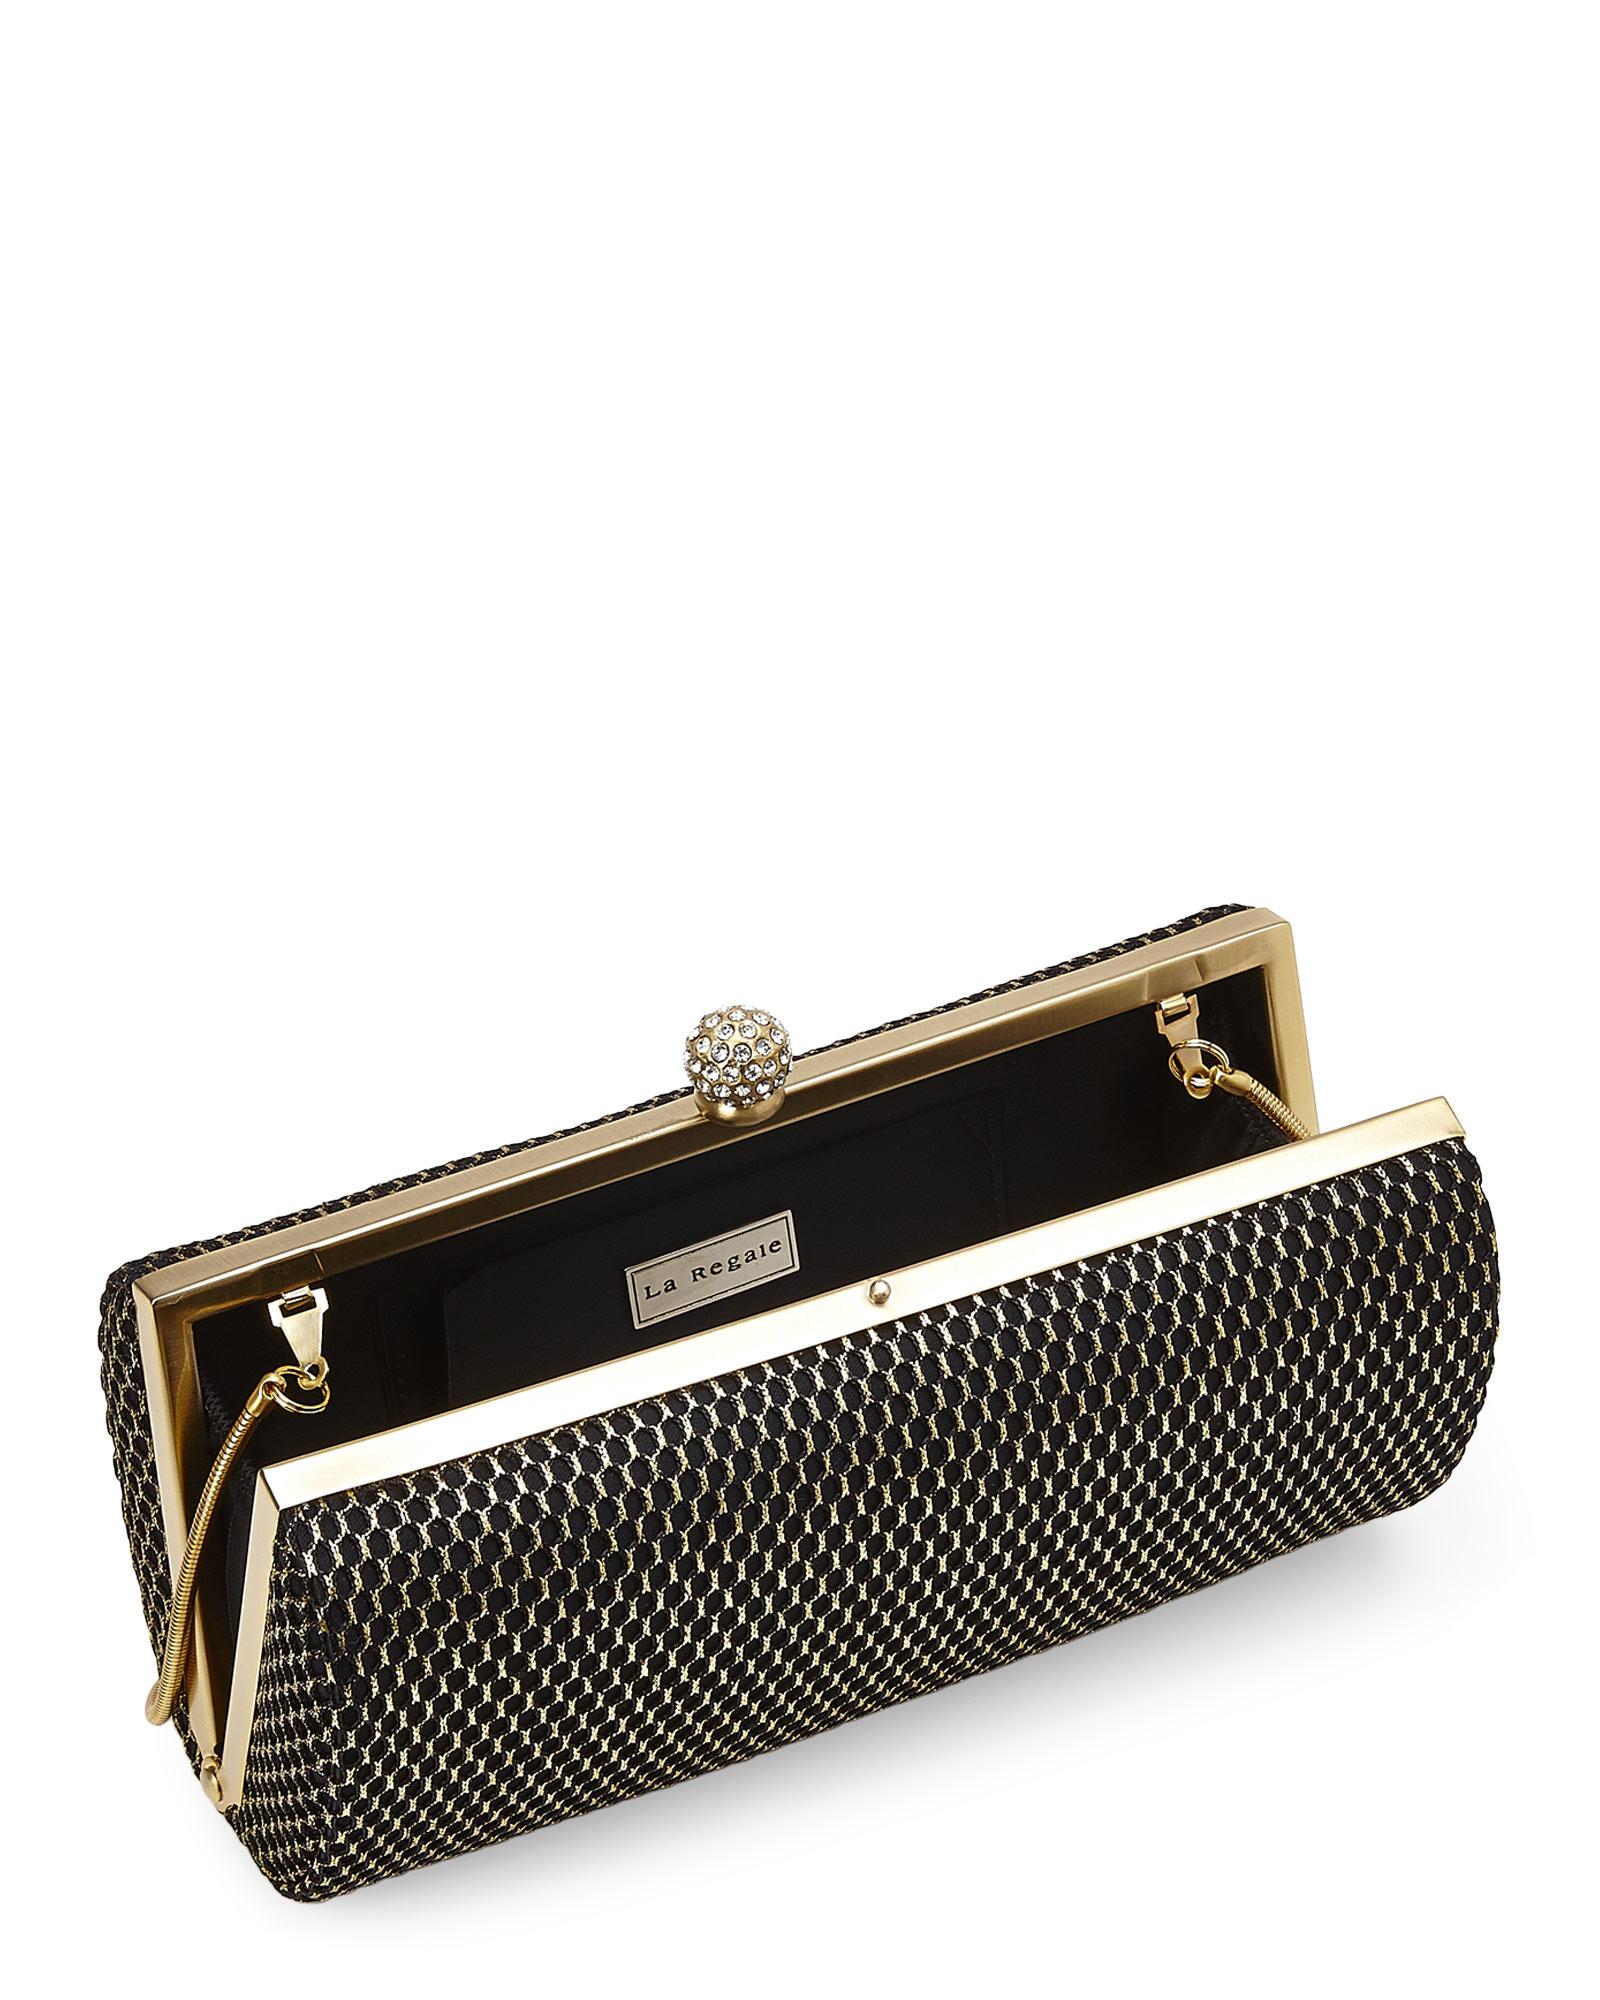 la regale black gold mesh minaudiere clutch in black lyst. Black Bedroom Furniture Sets. Home Design Ideas